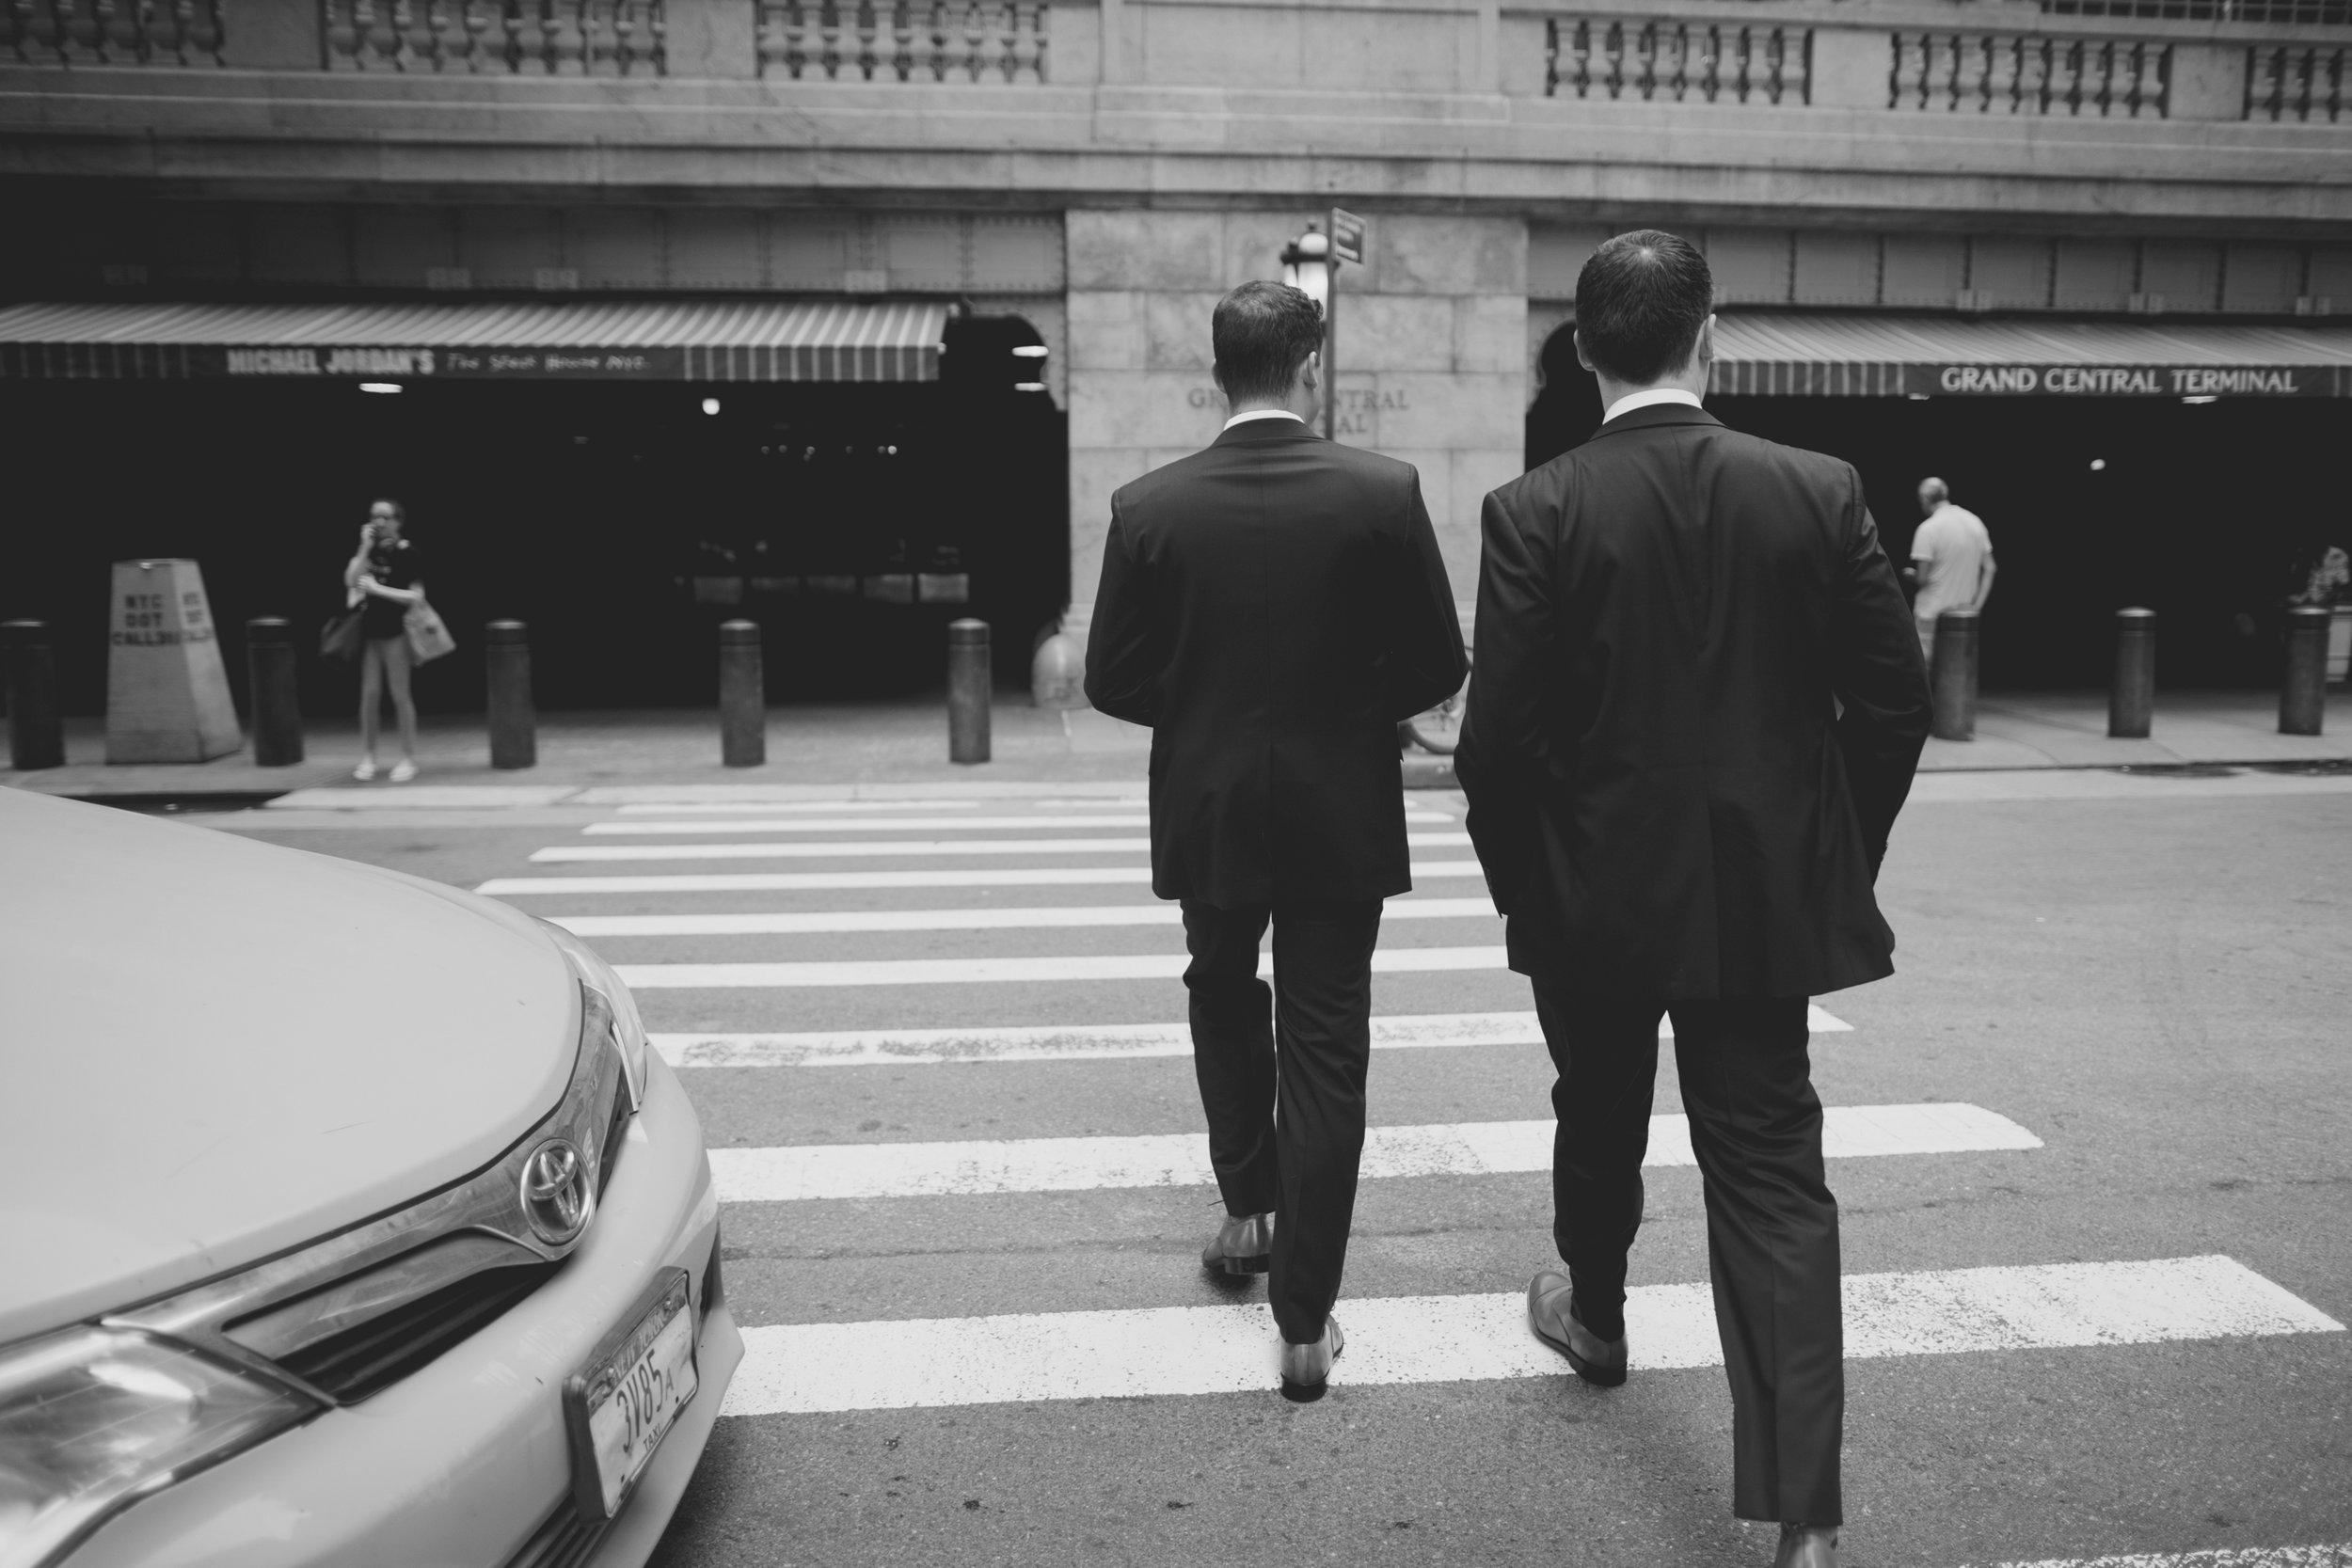 amanda_vanvels_new_york_lgbtq_gay_wedding_034.jpg